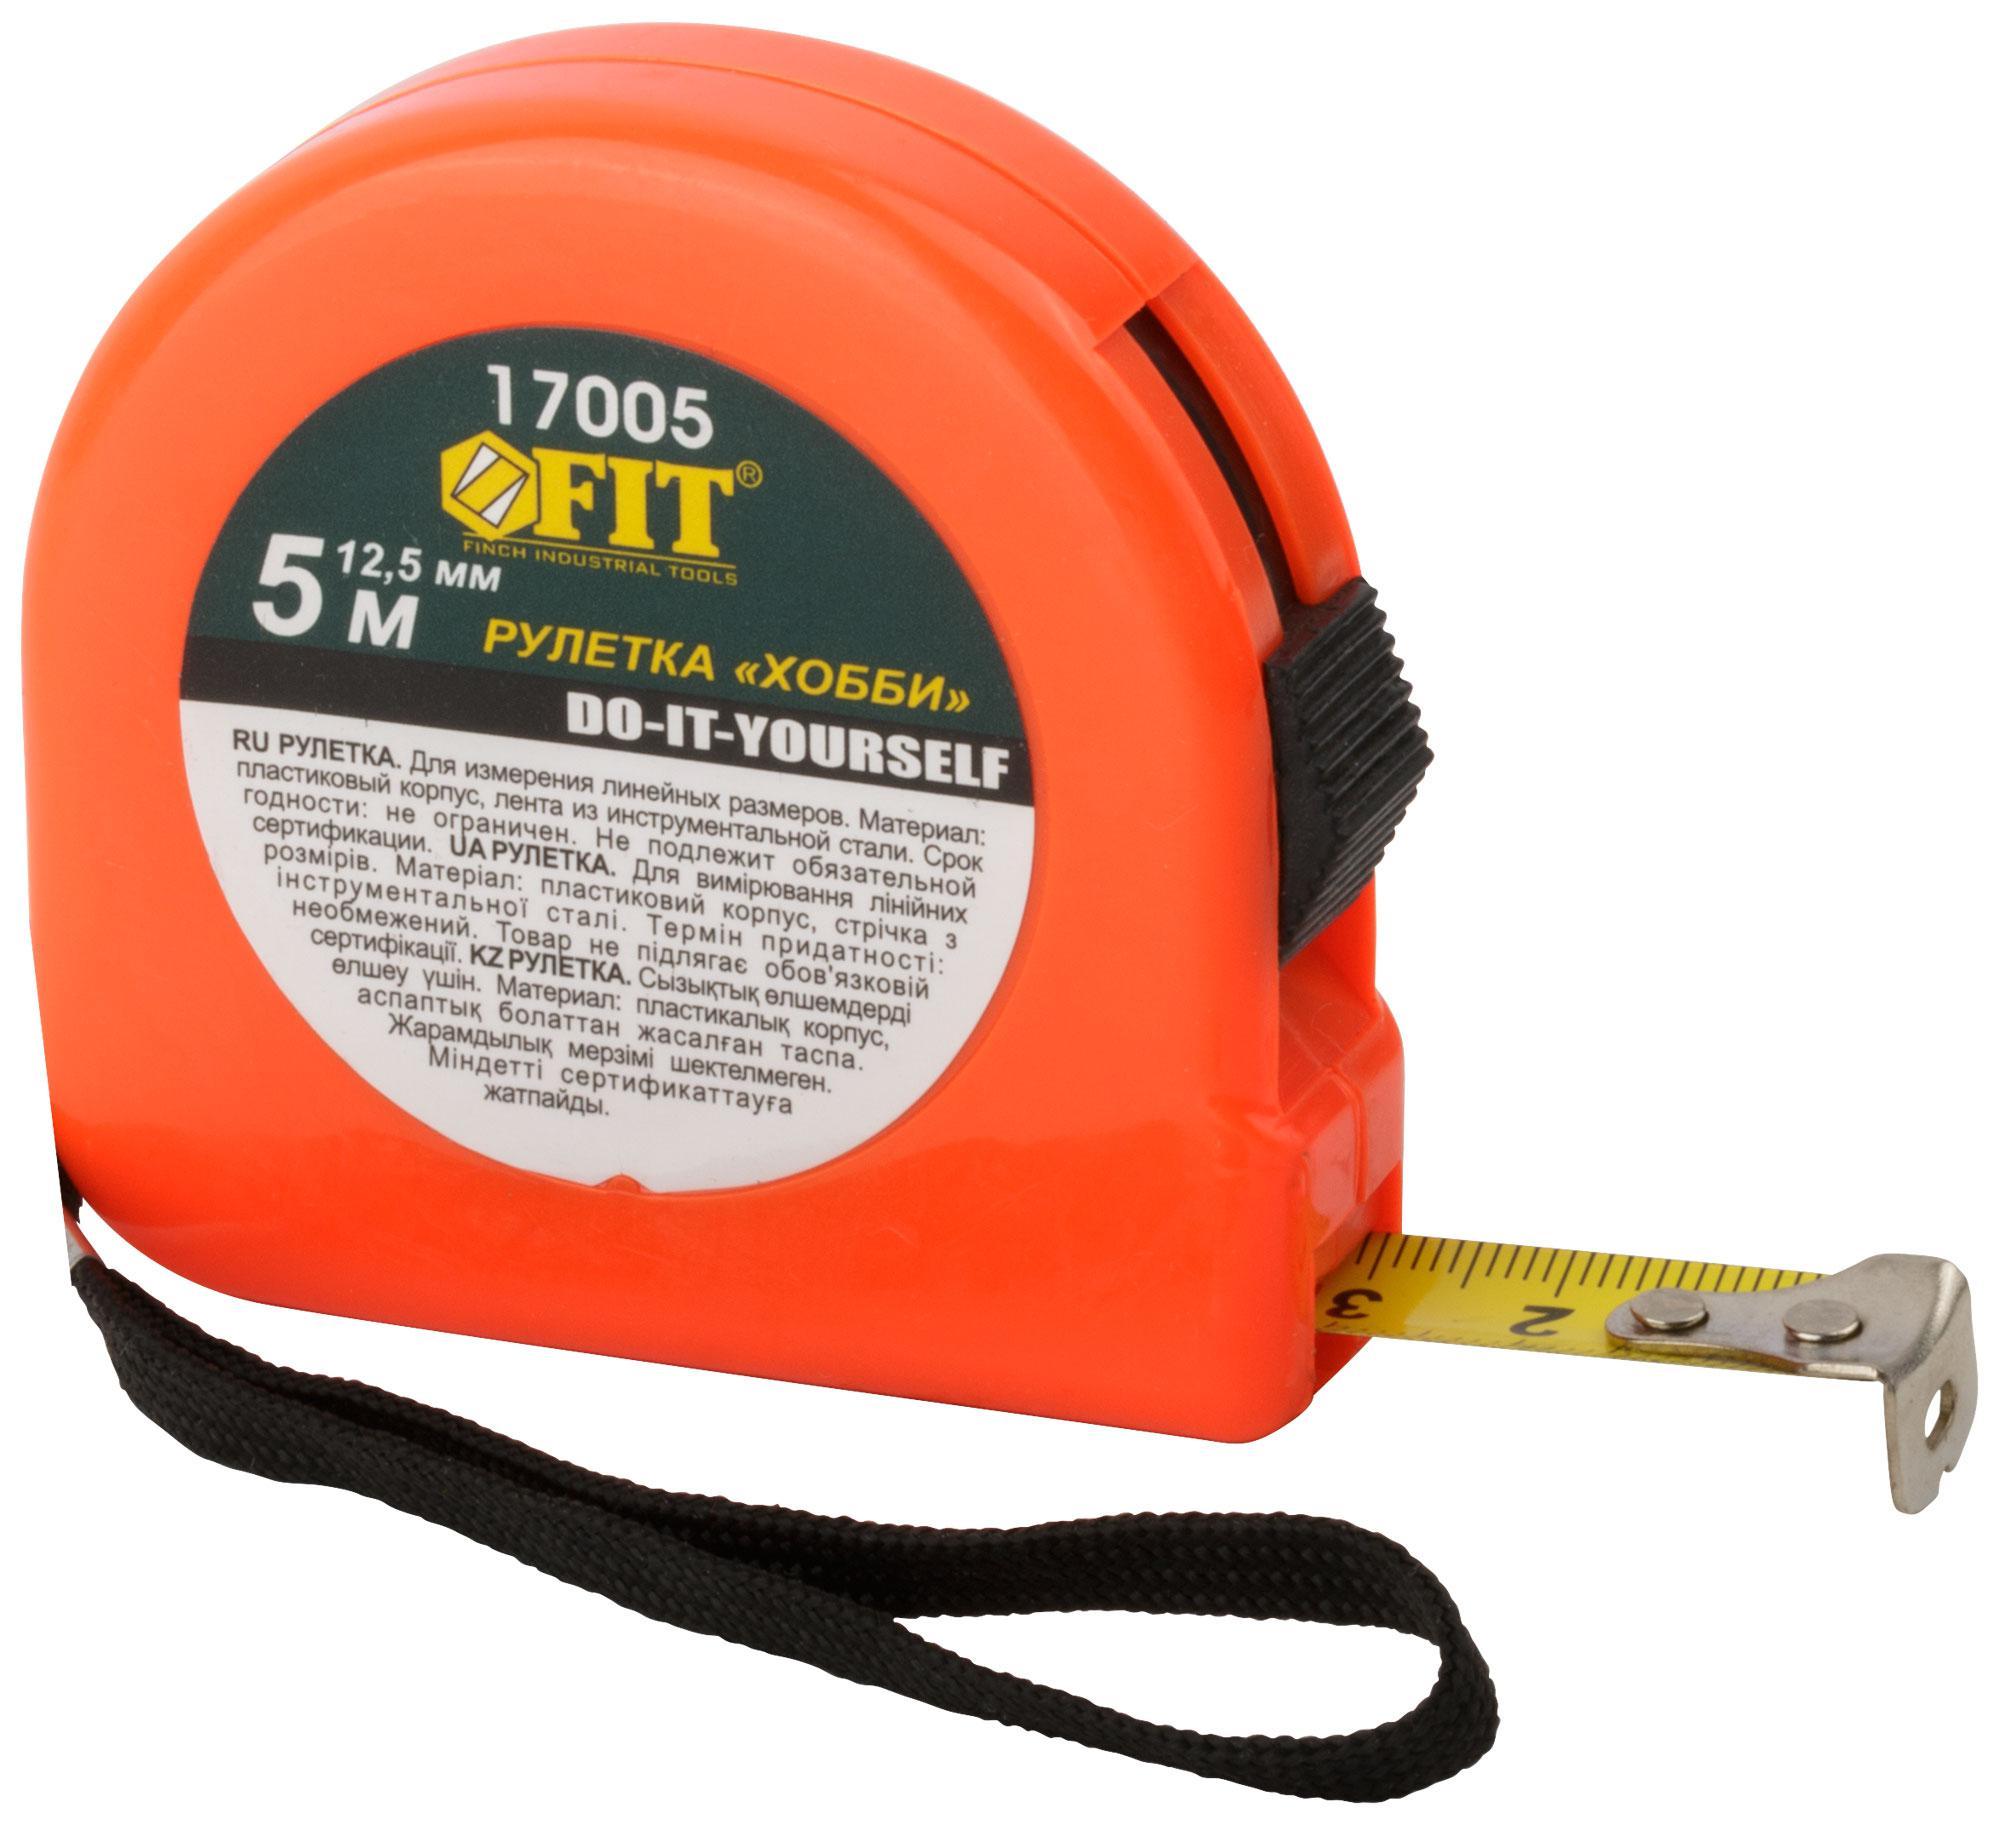 Рулетка Fit 17005